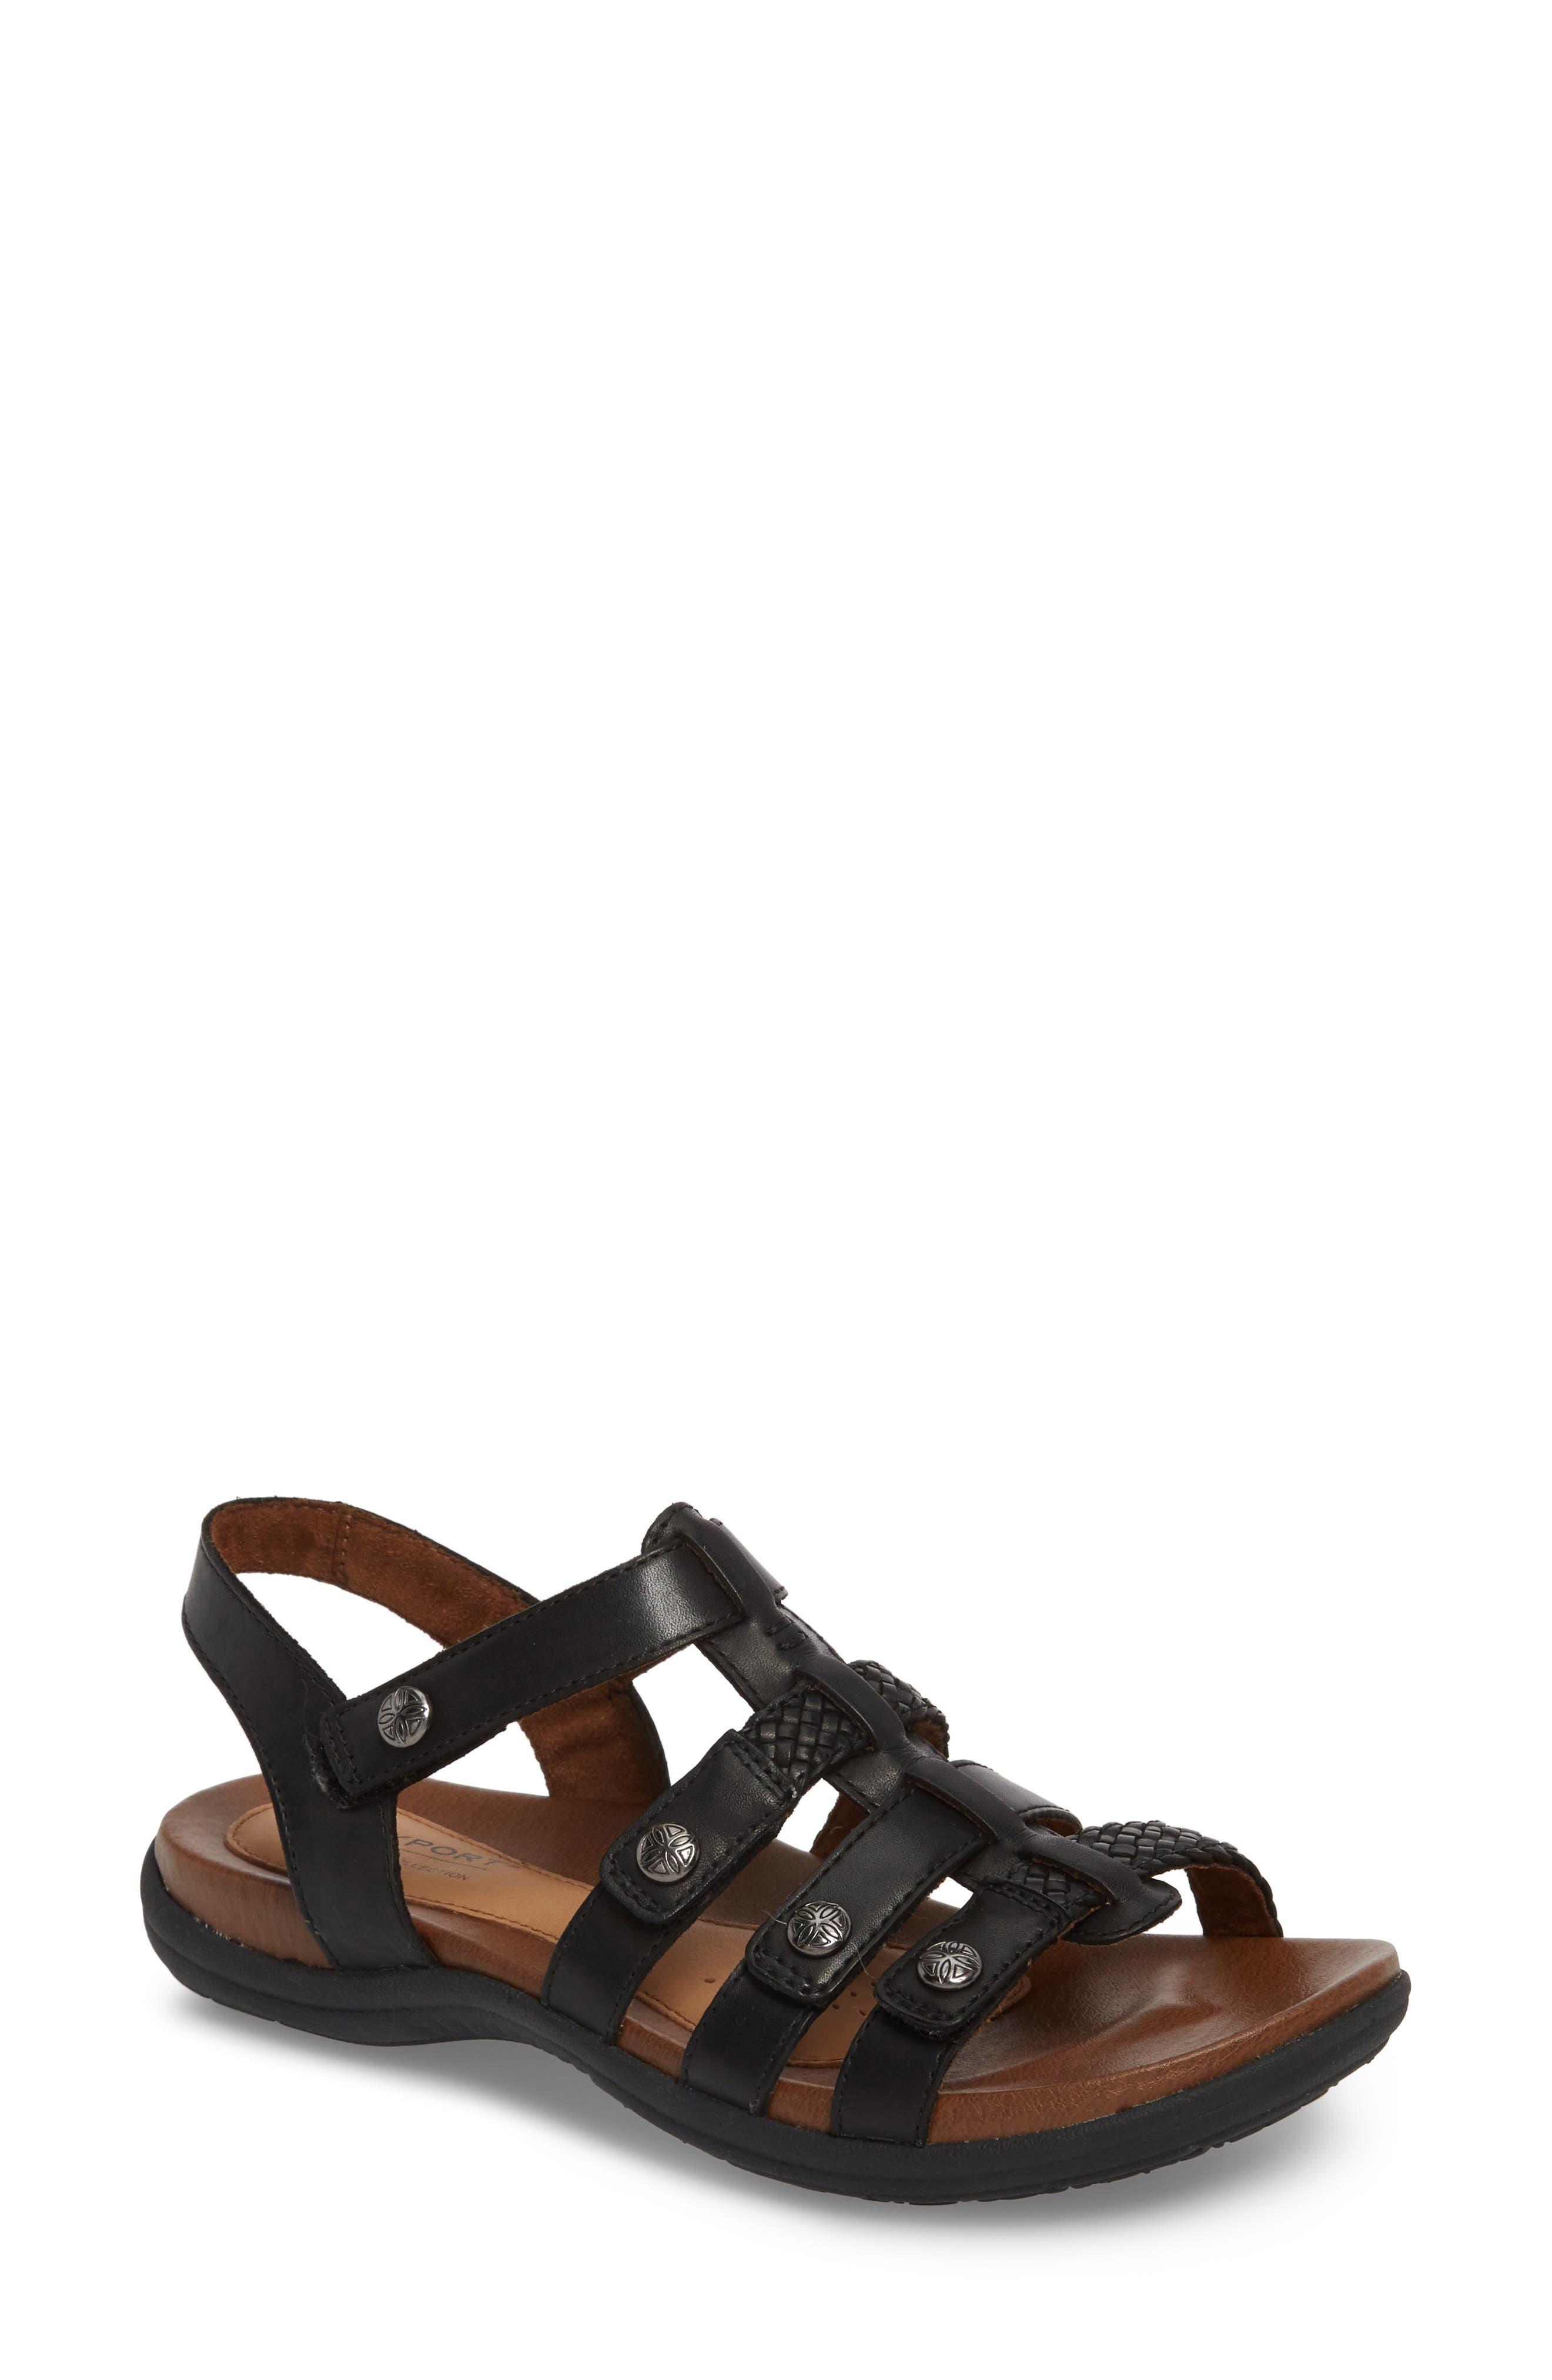 Rubey T-Strap Sandal,                             Main thumbnail 1, color,                             BLACK LEATHER